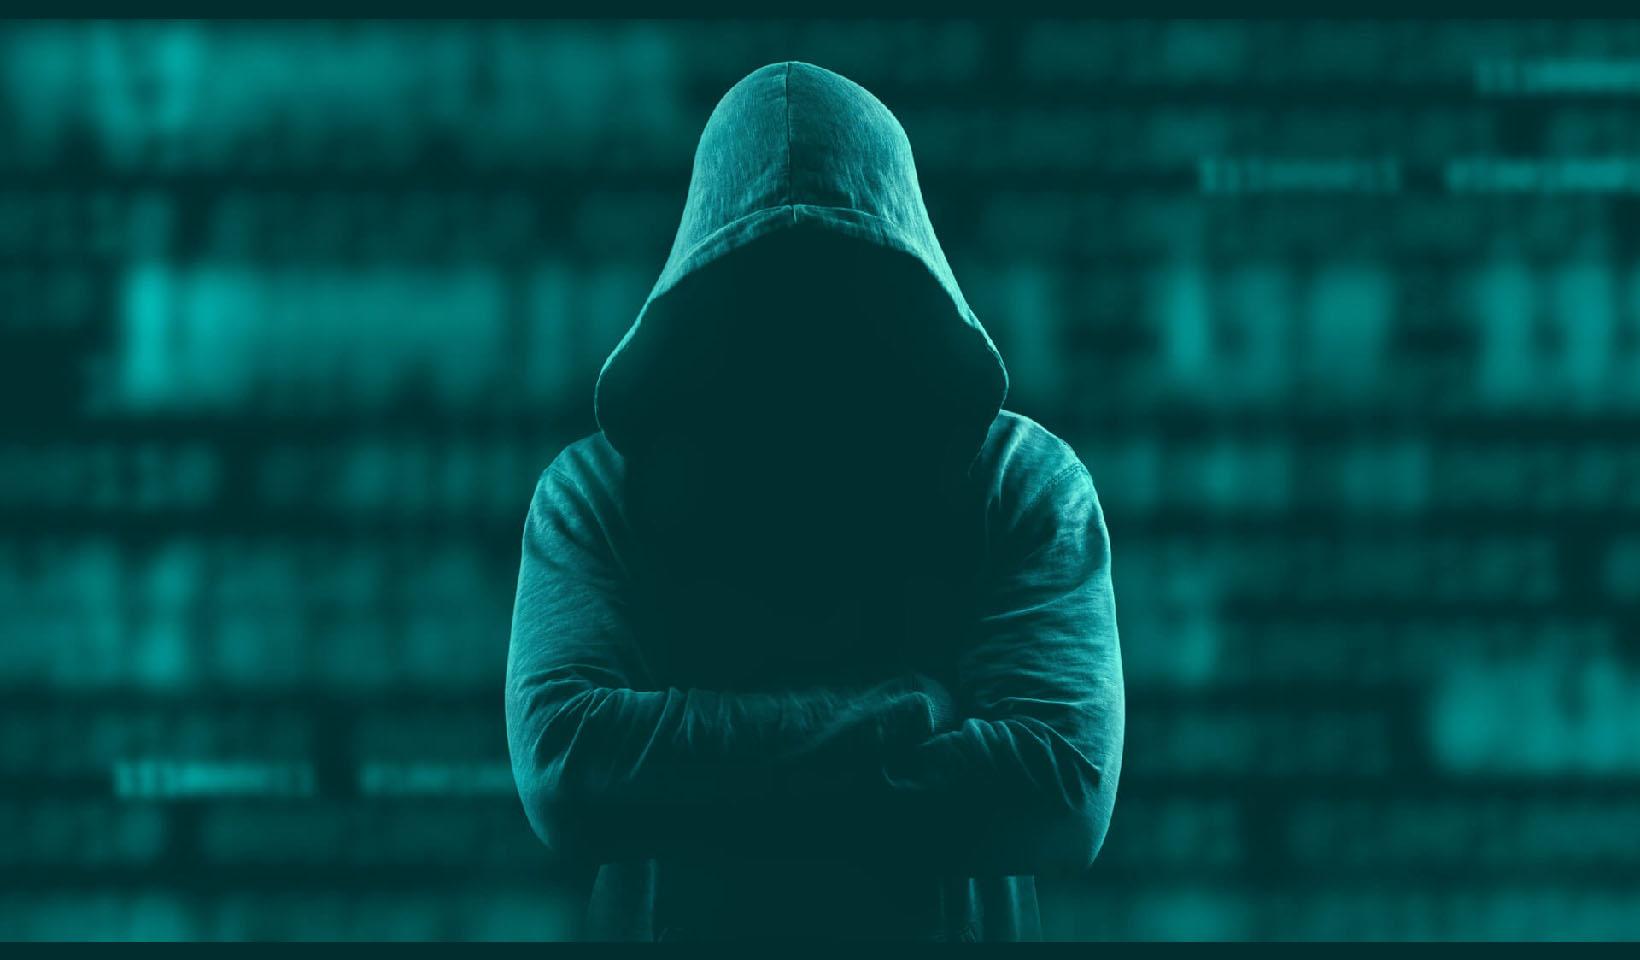 deep web, darknet, deep web giriş, darknet giriş, deep web nedir, darknet nedir